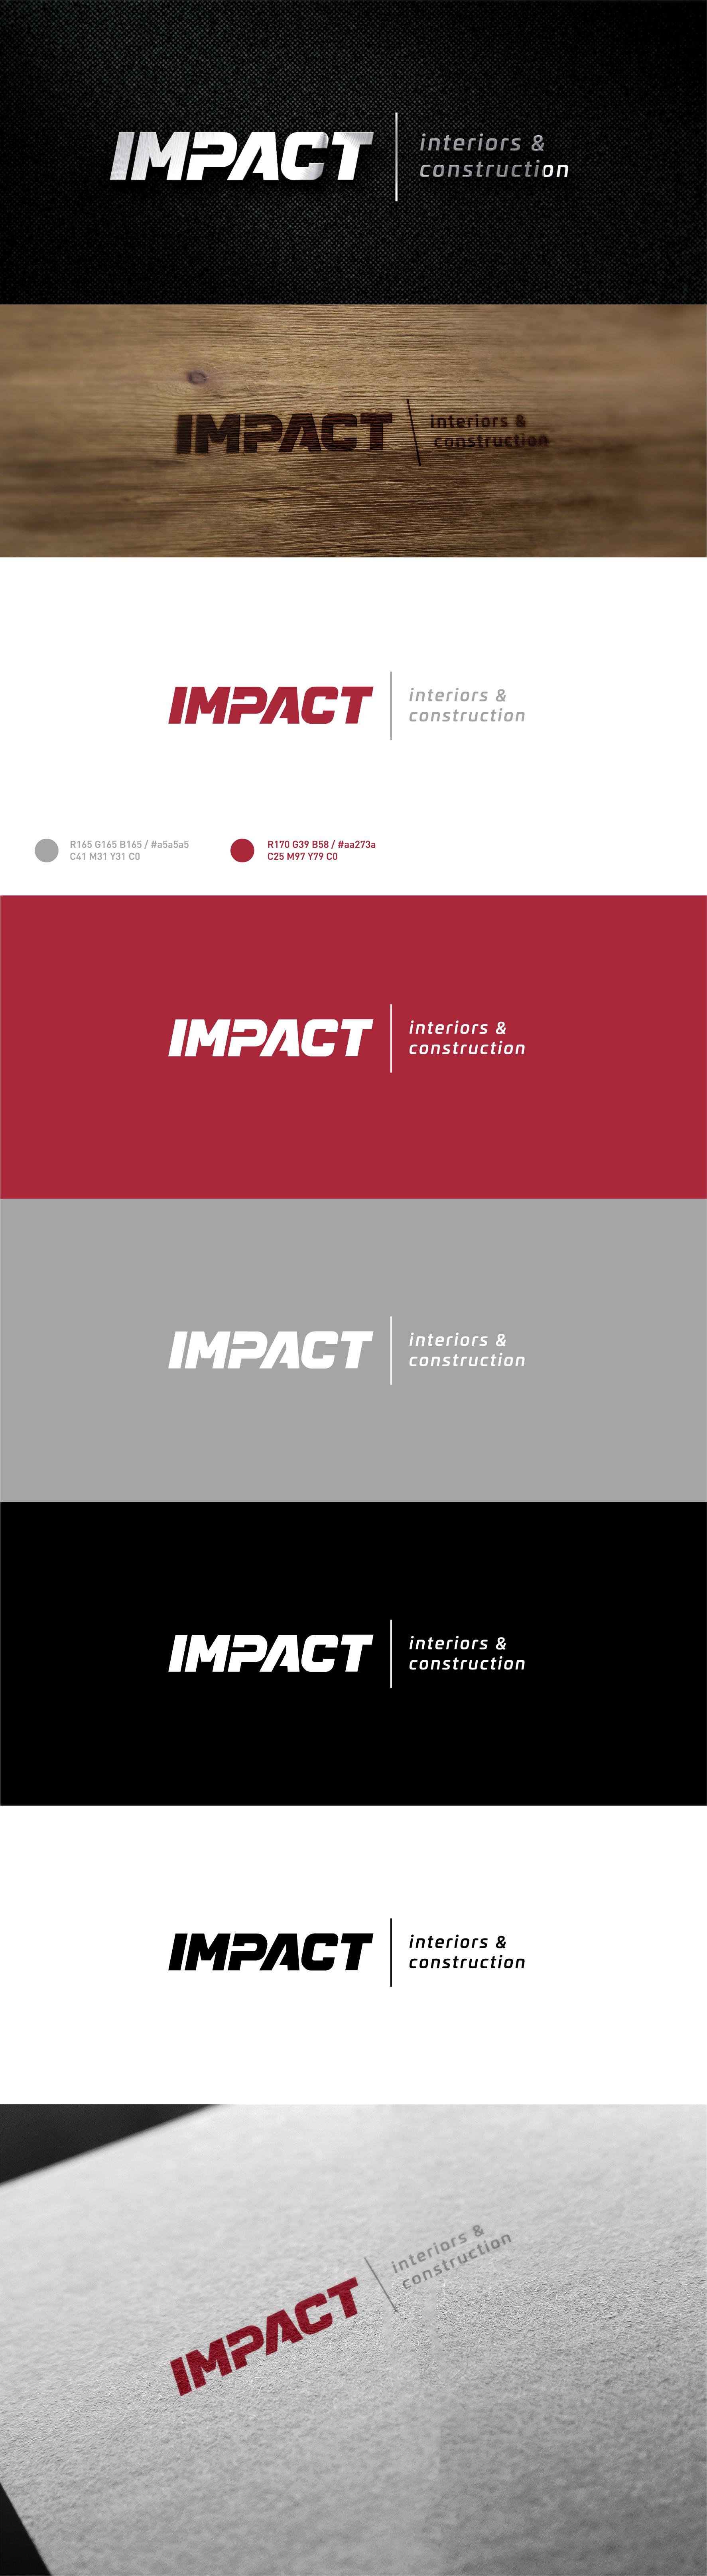 New logo for IMPACT INTERIORS